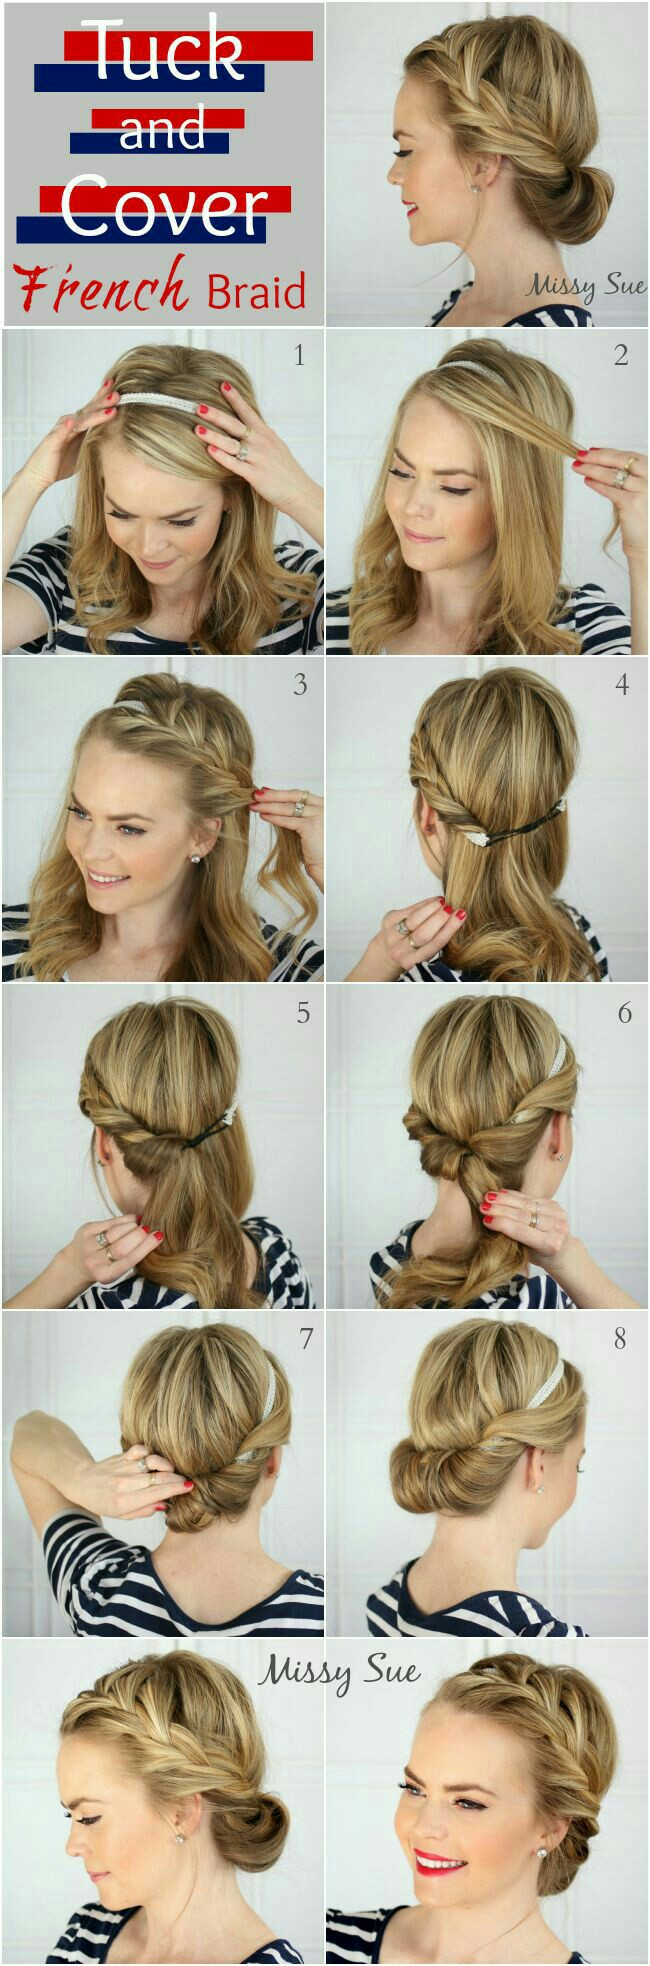 Pin by diana gonzalez on hair pinterest hair style bun hair and